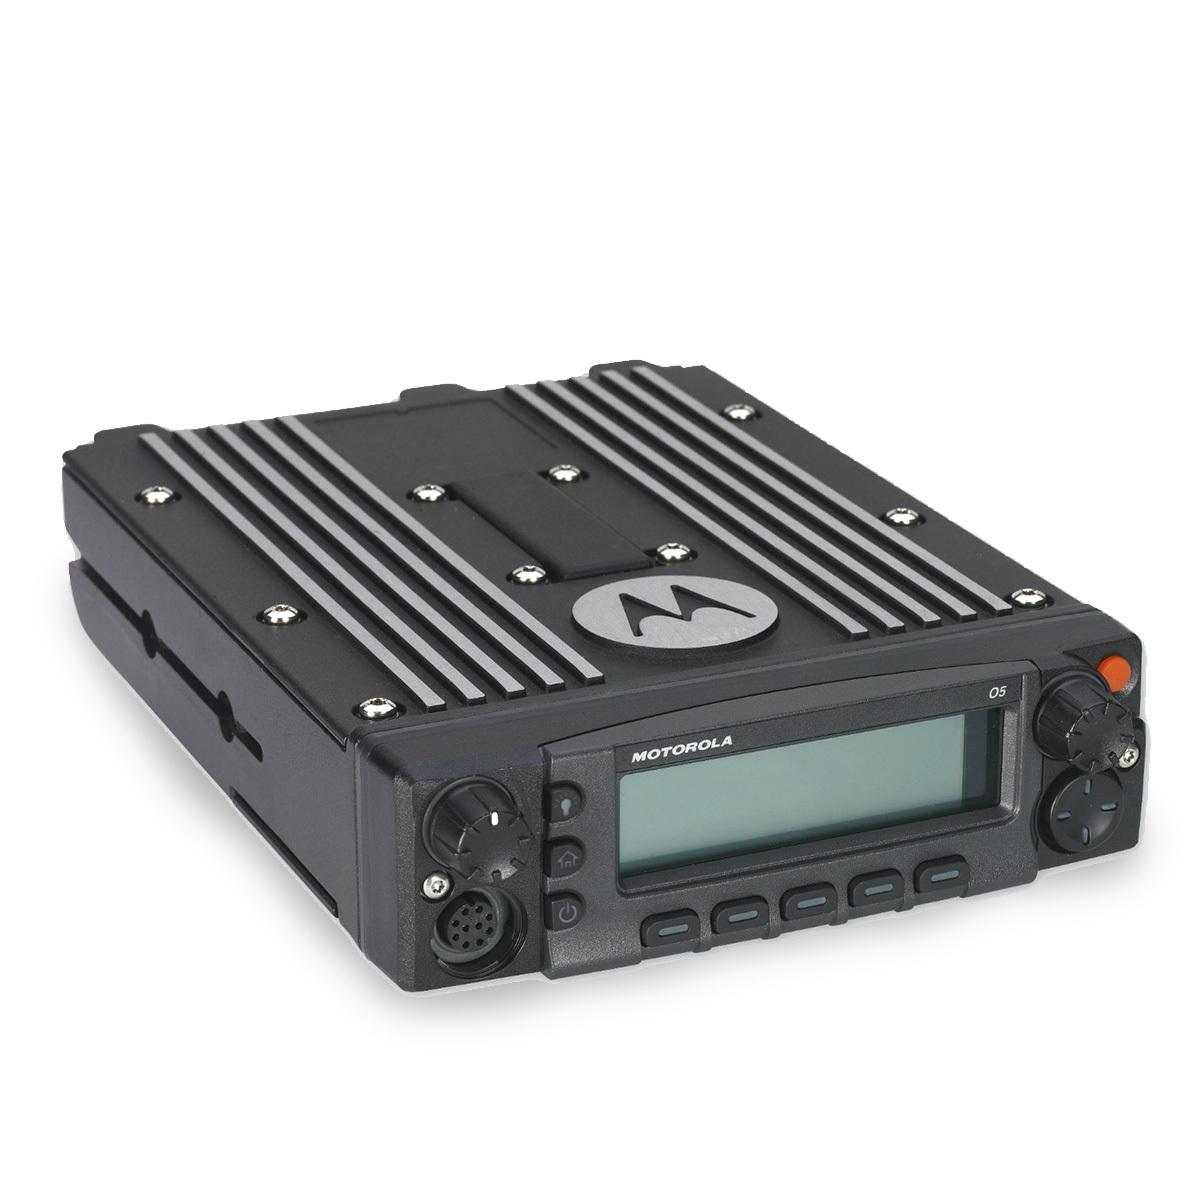 Radio Motorola APX 7500 P25 Digital